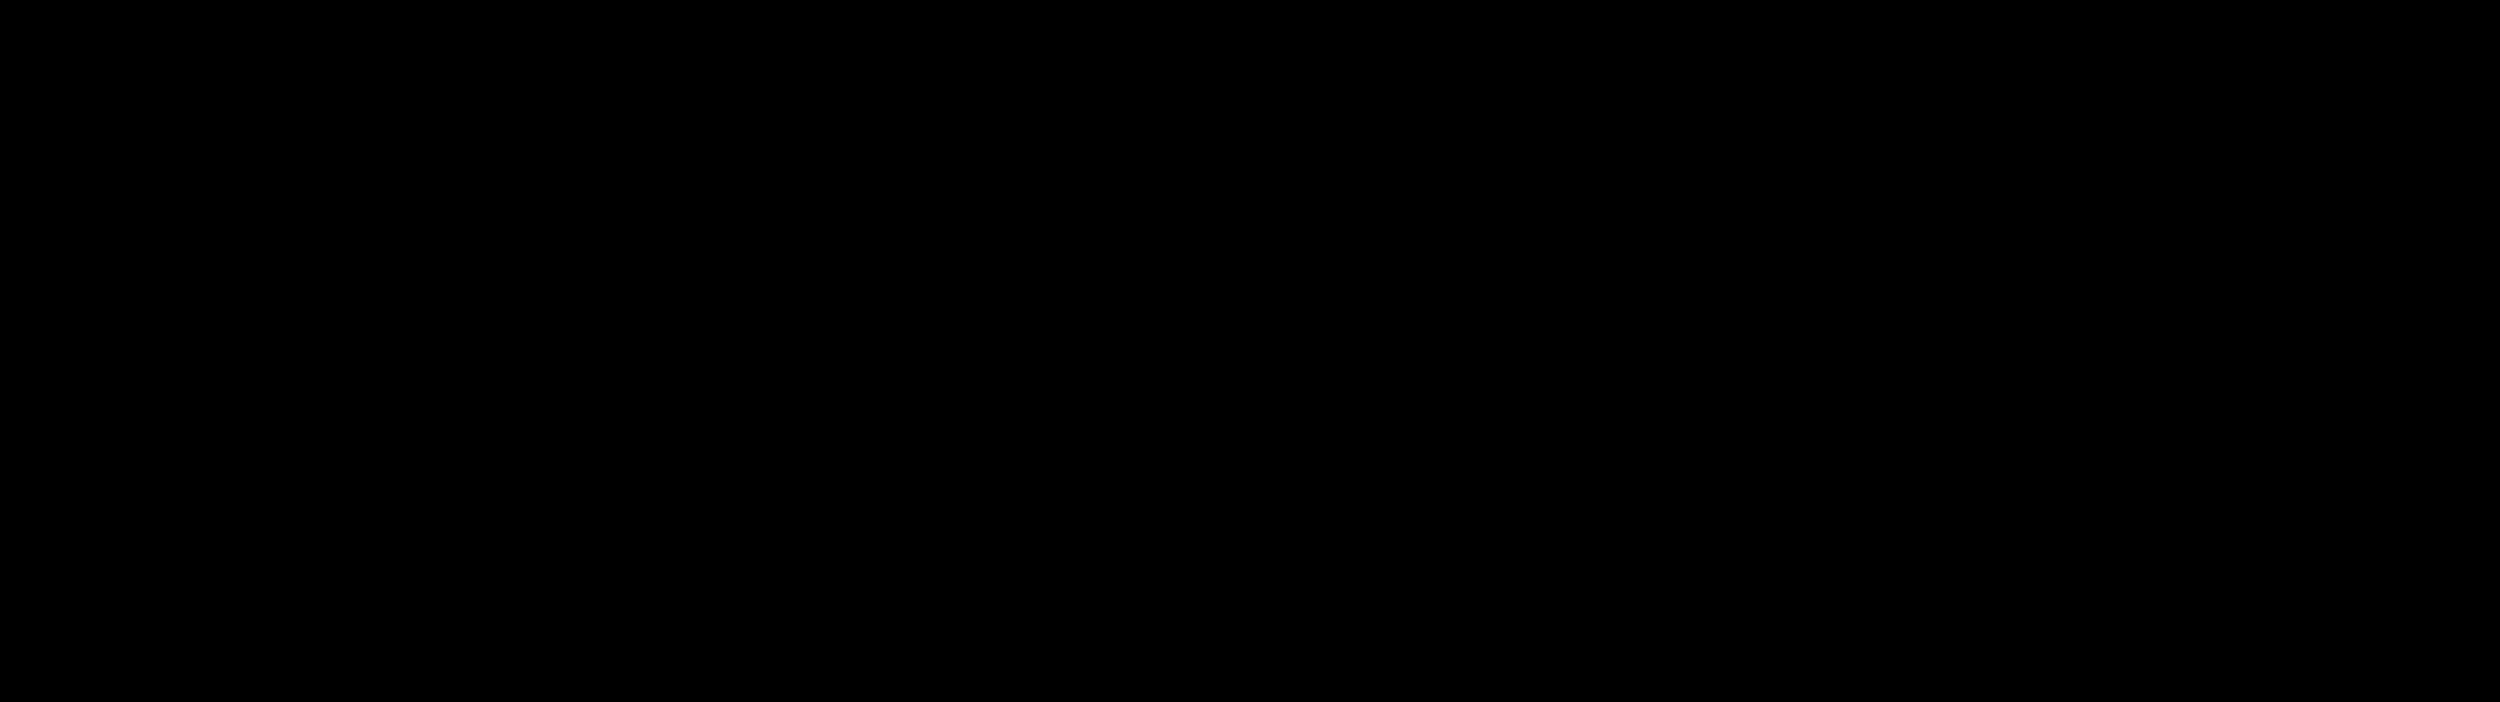 Nigel Wallace Photography Logo